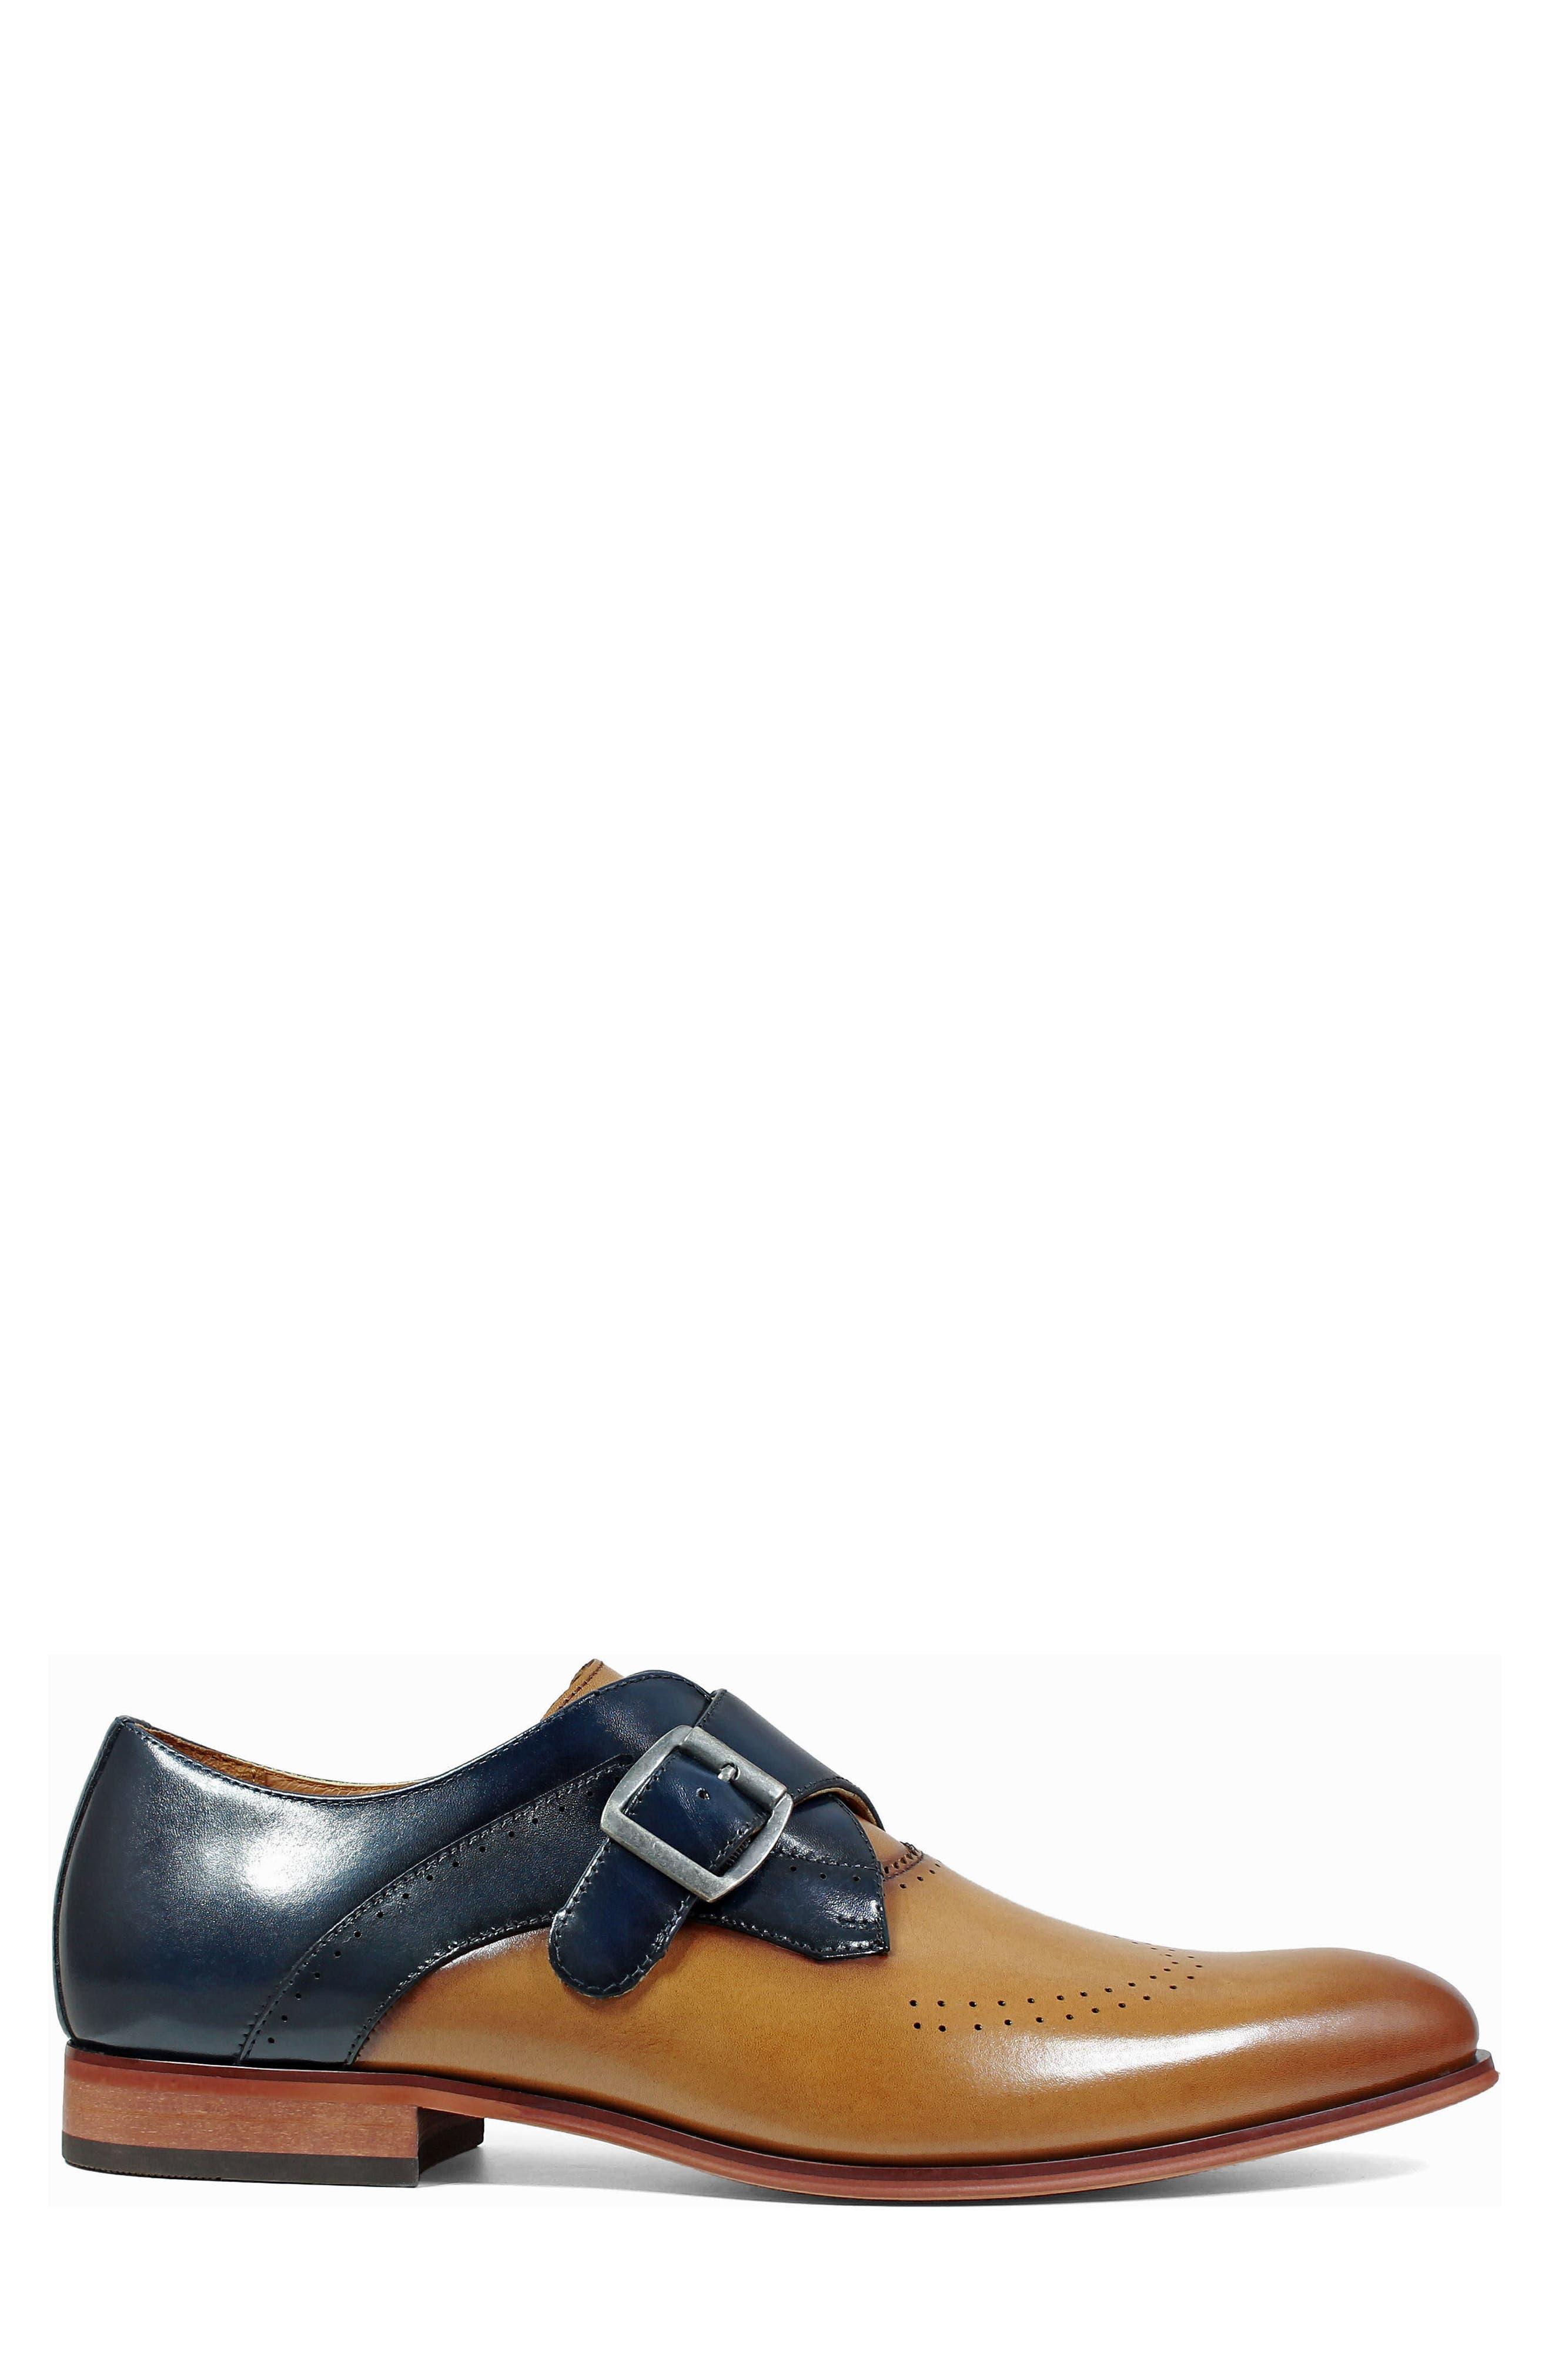 Alternate Image 3  - Stacy Adams Saxon Perforated Monk Shoe (Men)